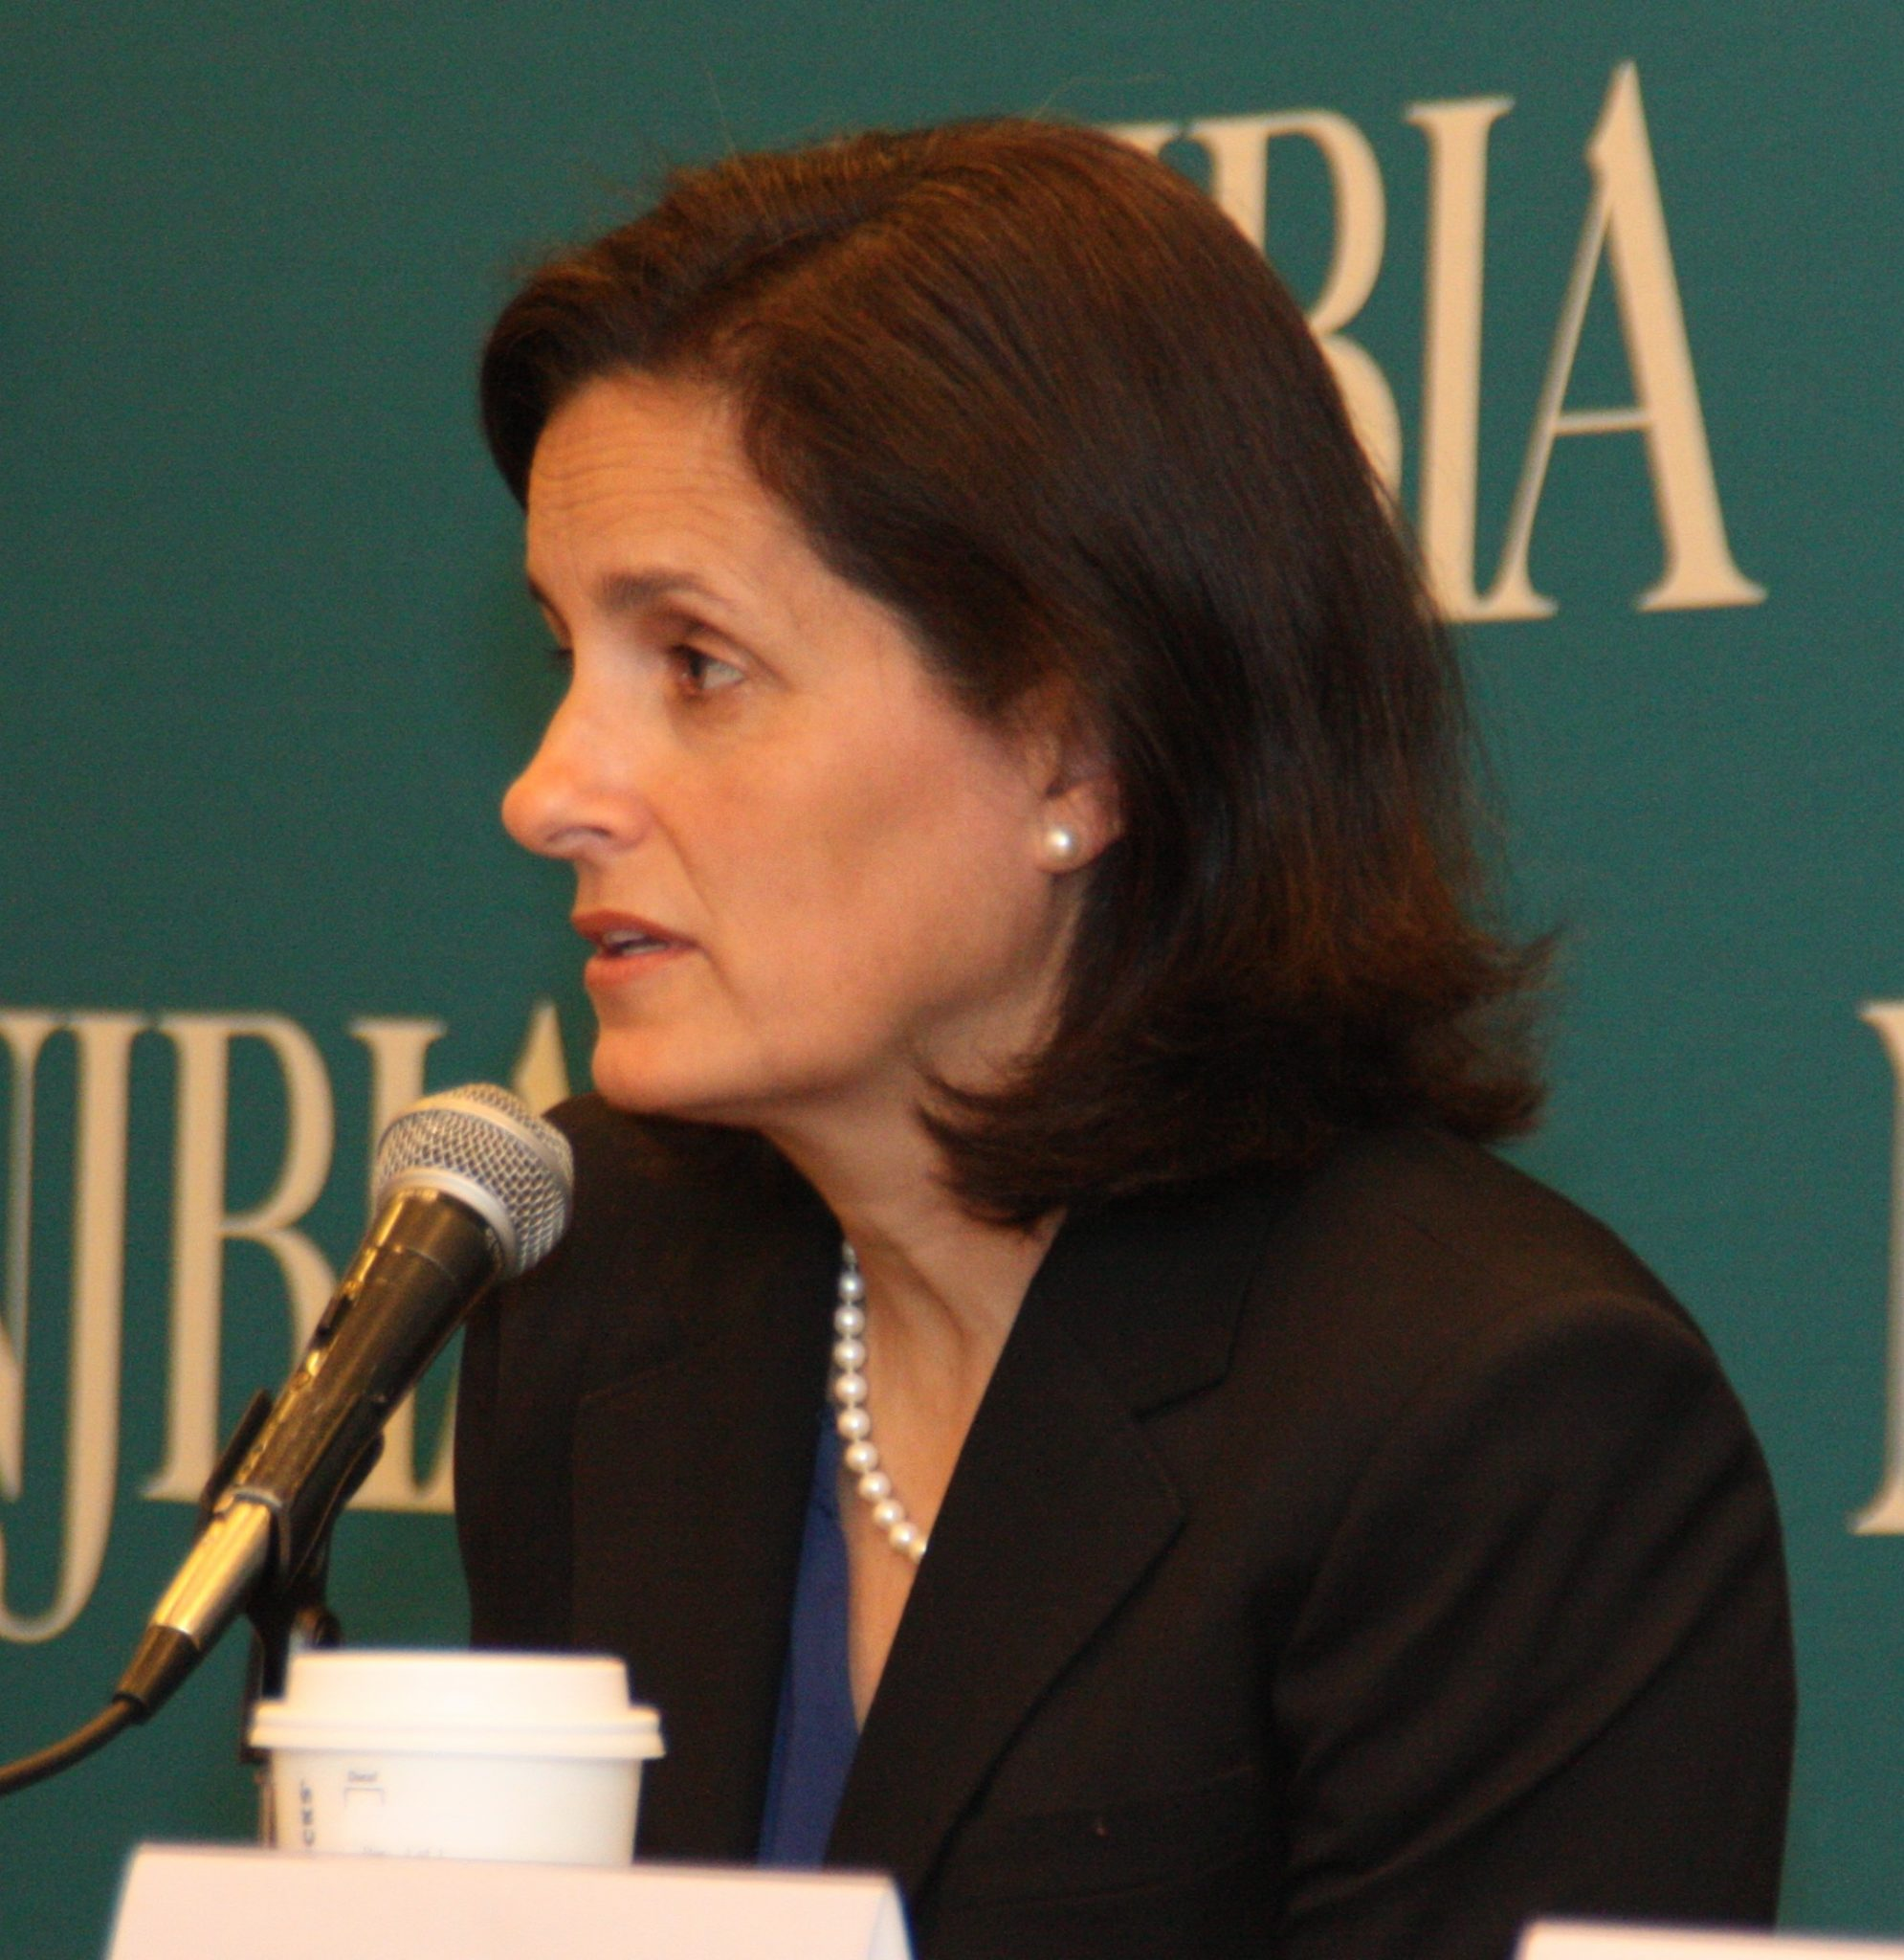 Treasurer Elizabeth Maher Muoio